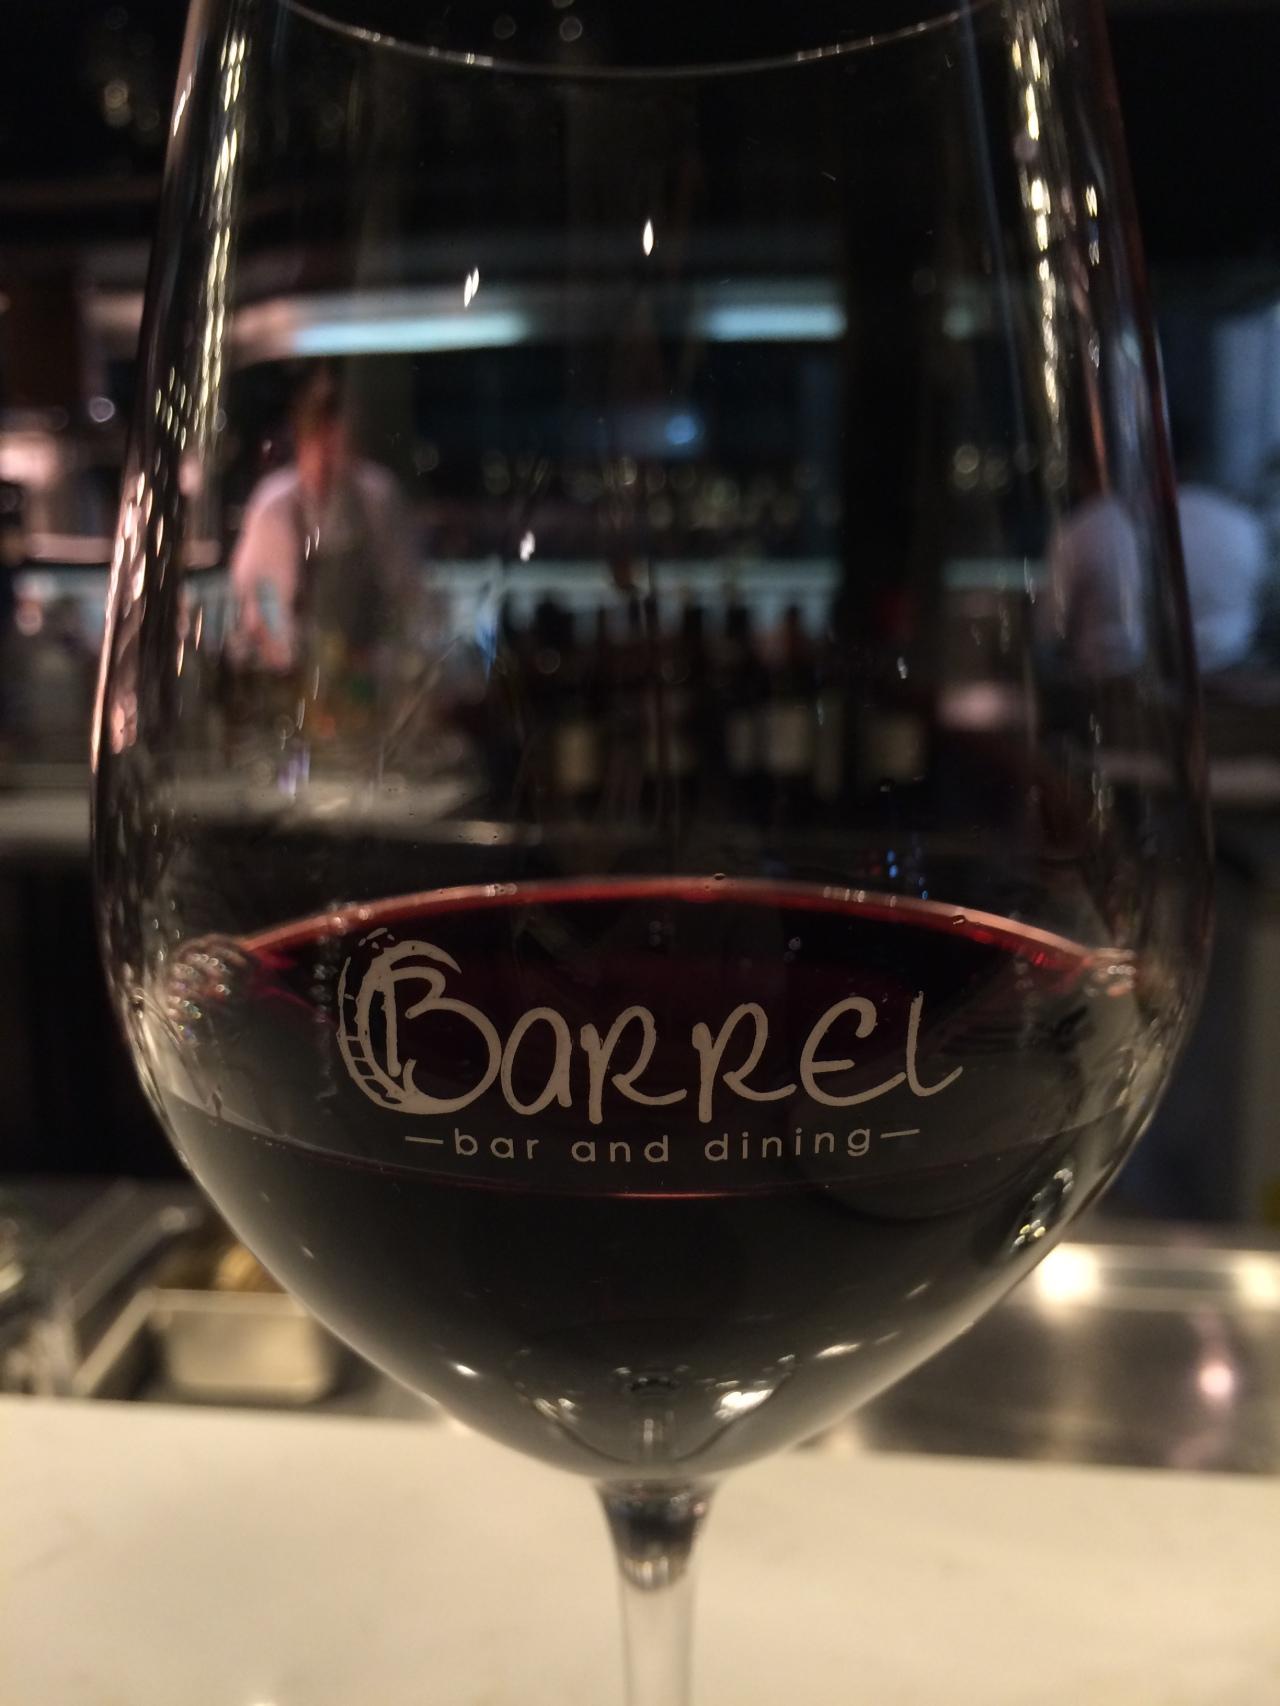 Barrel Bar & Dining, Cremorne,Sydney